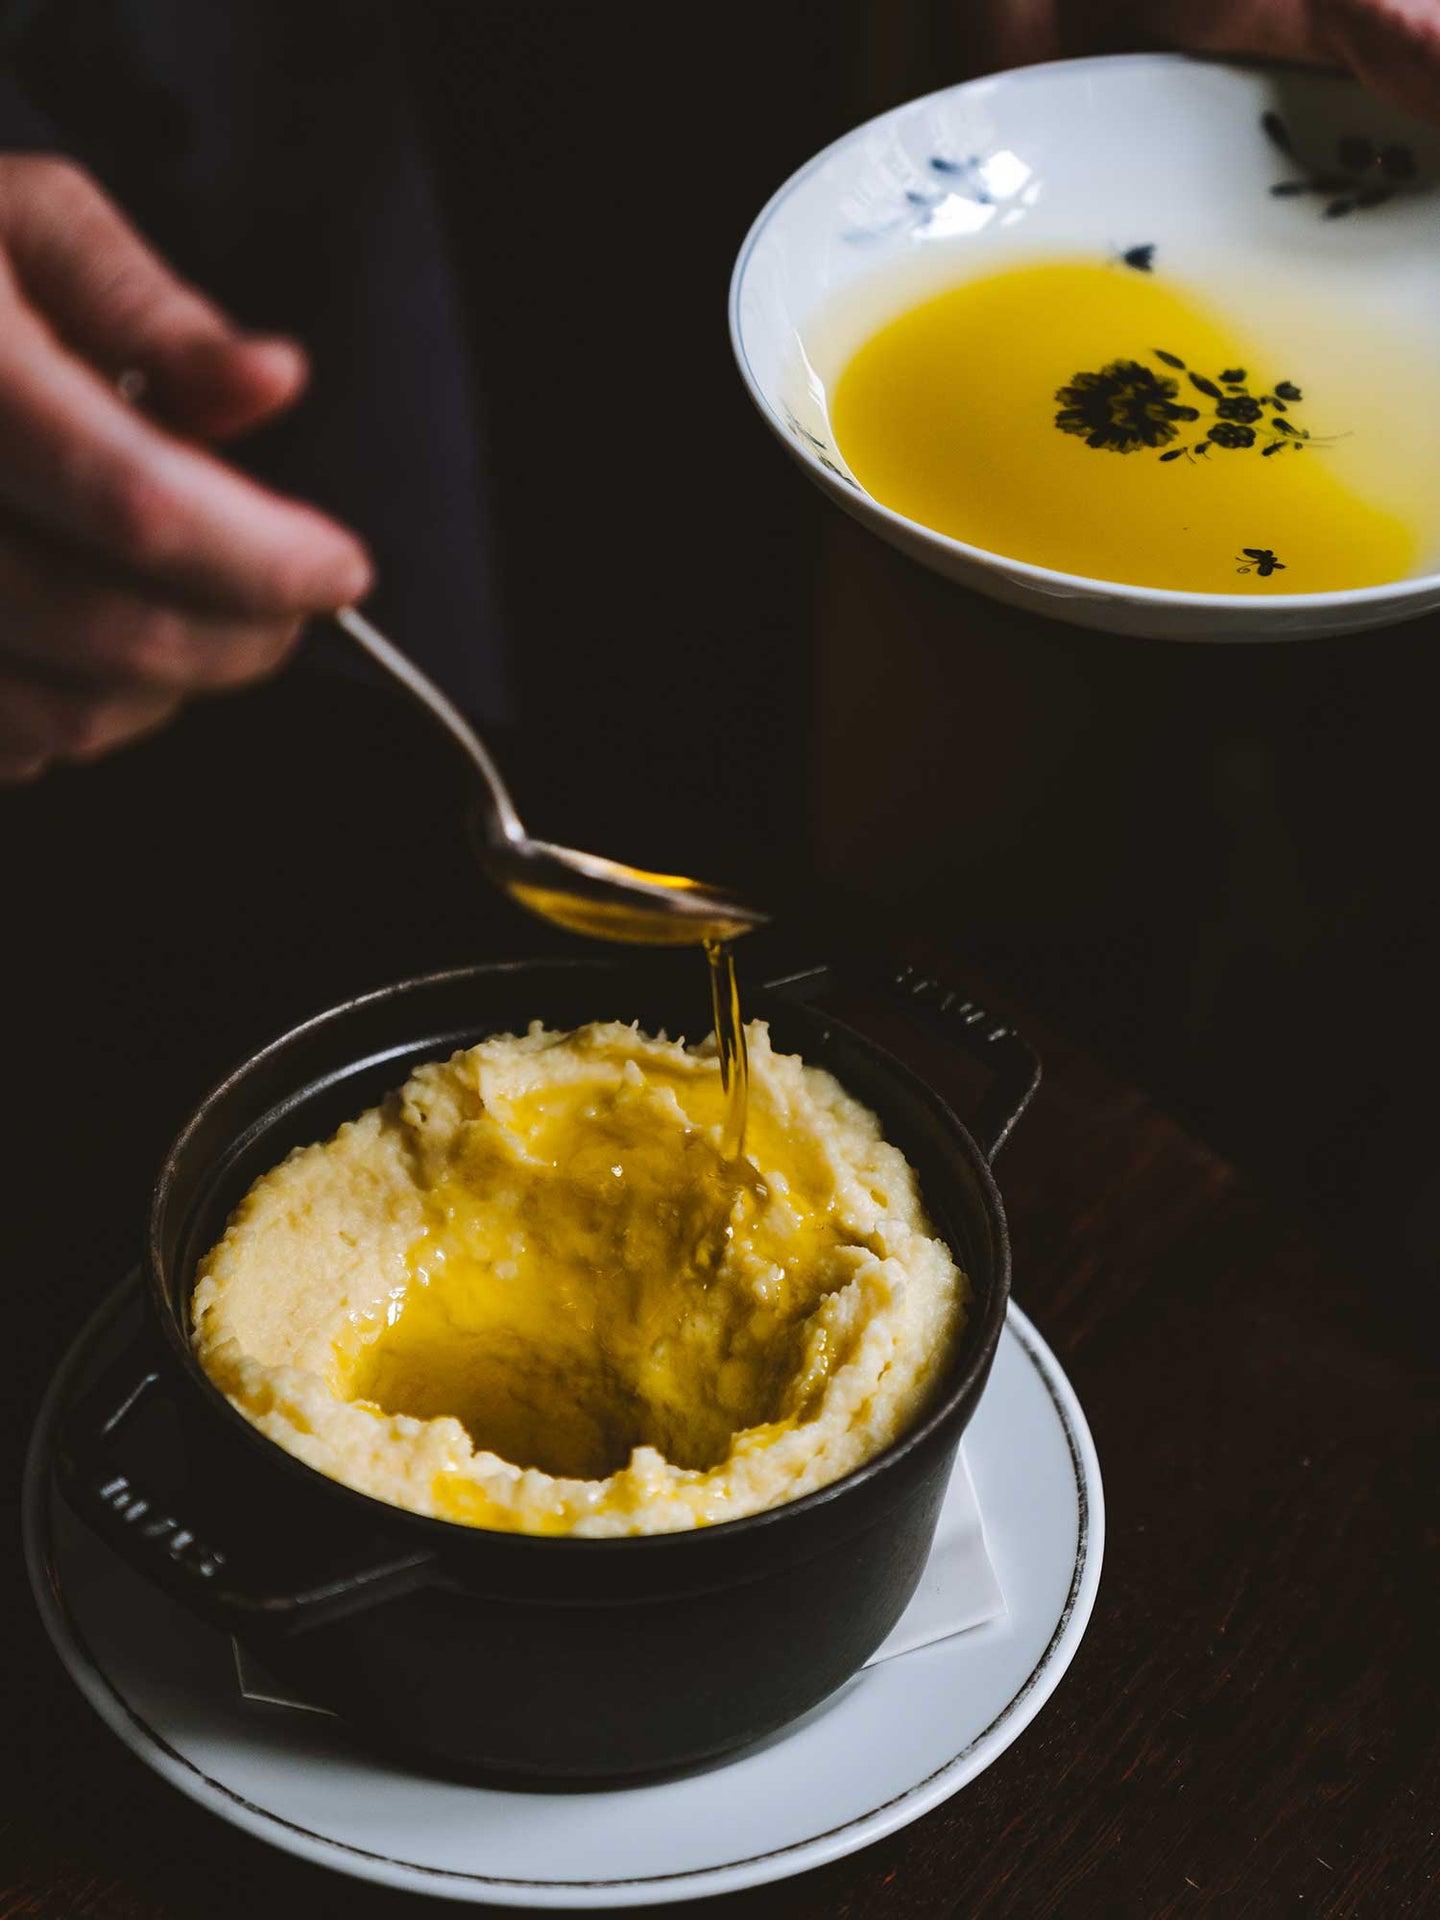 Mashed Potatoes with Provençal Olive Oil